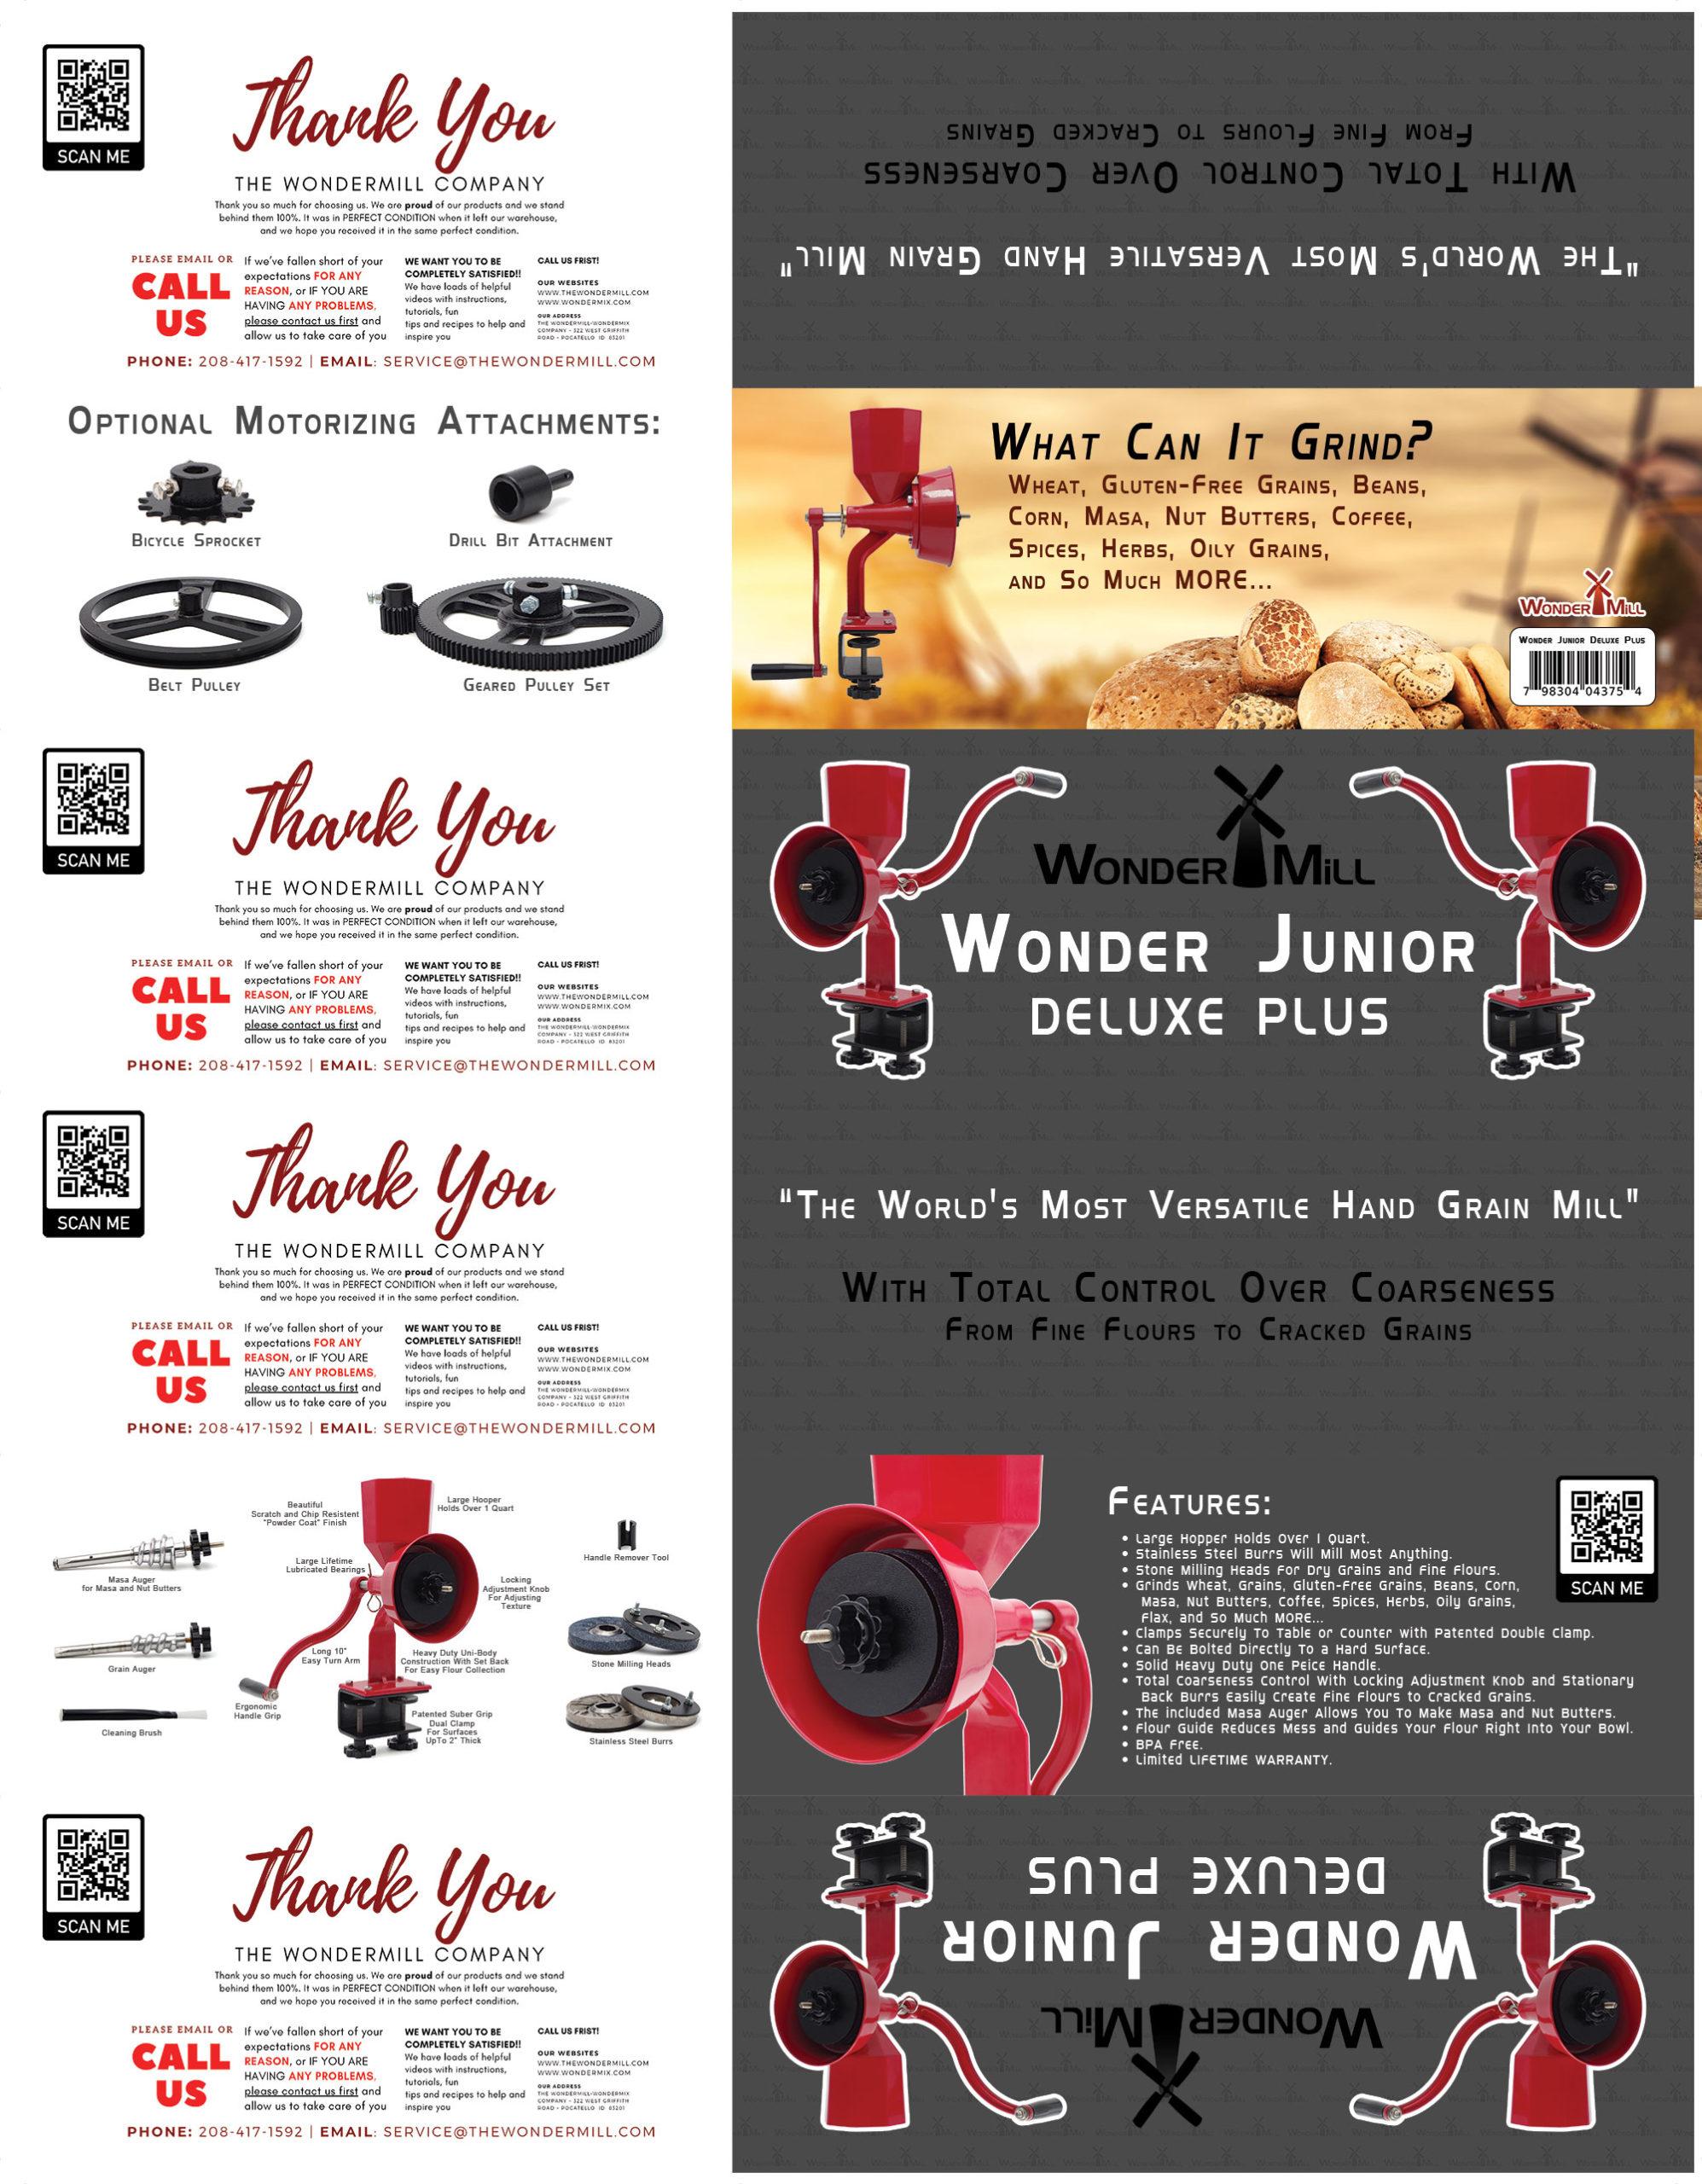 Wonder Junior Deluxe PLUS Hand Grain Mill (red)